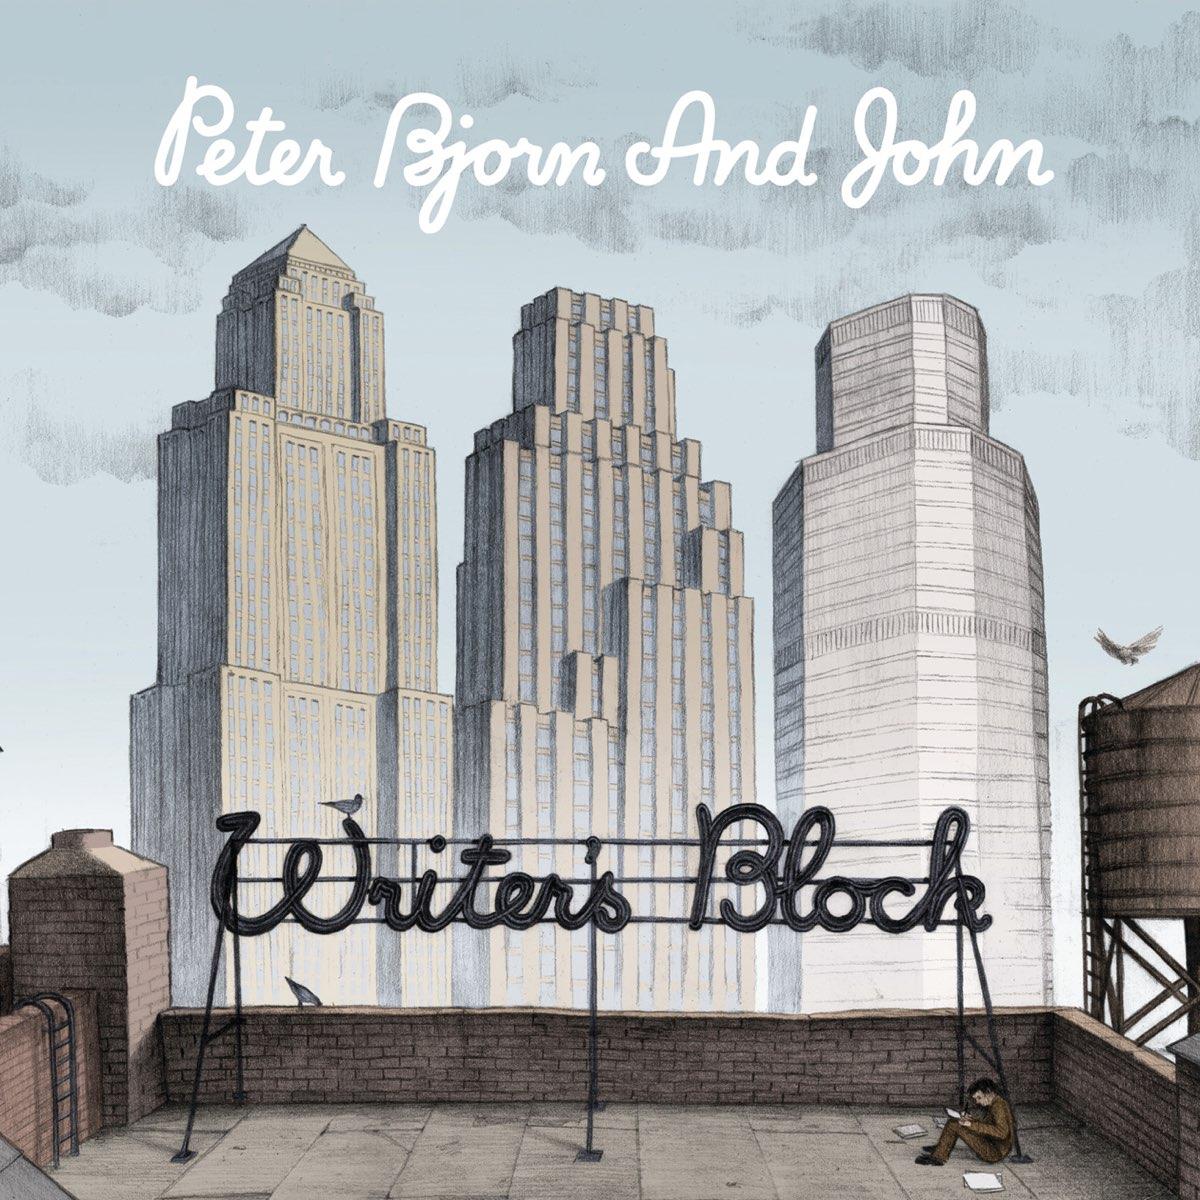 Peter Bjorn And John, Writer's Block